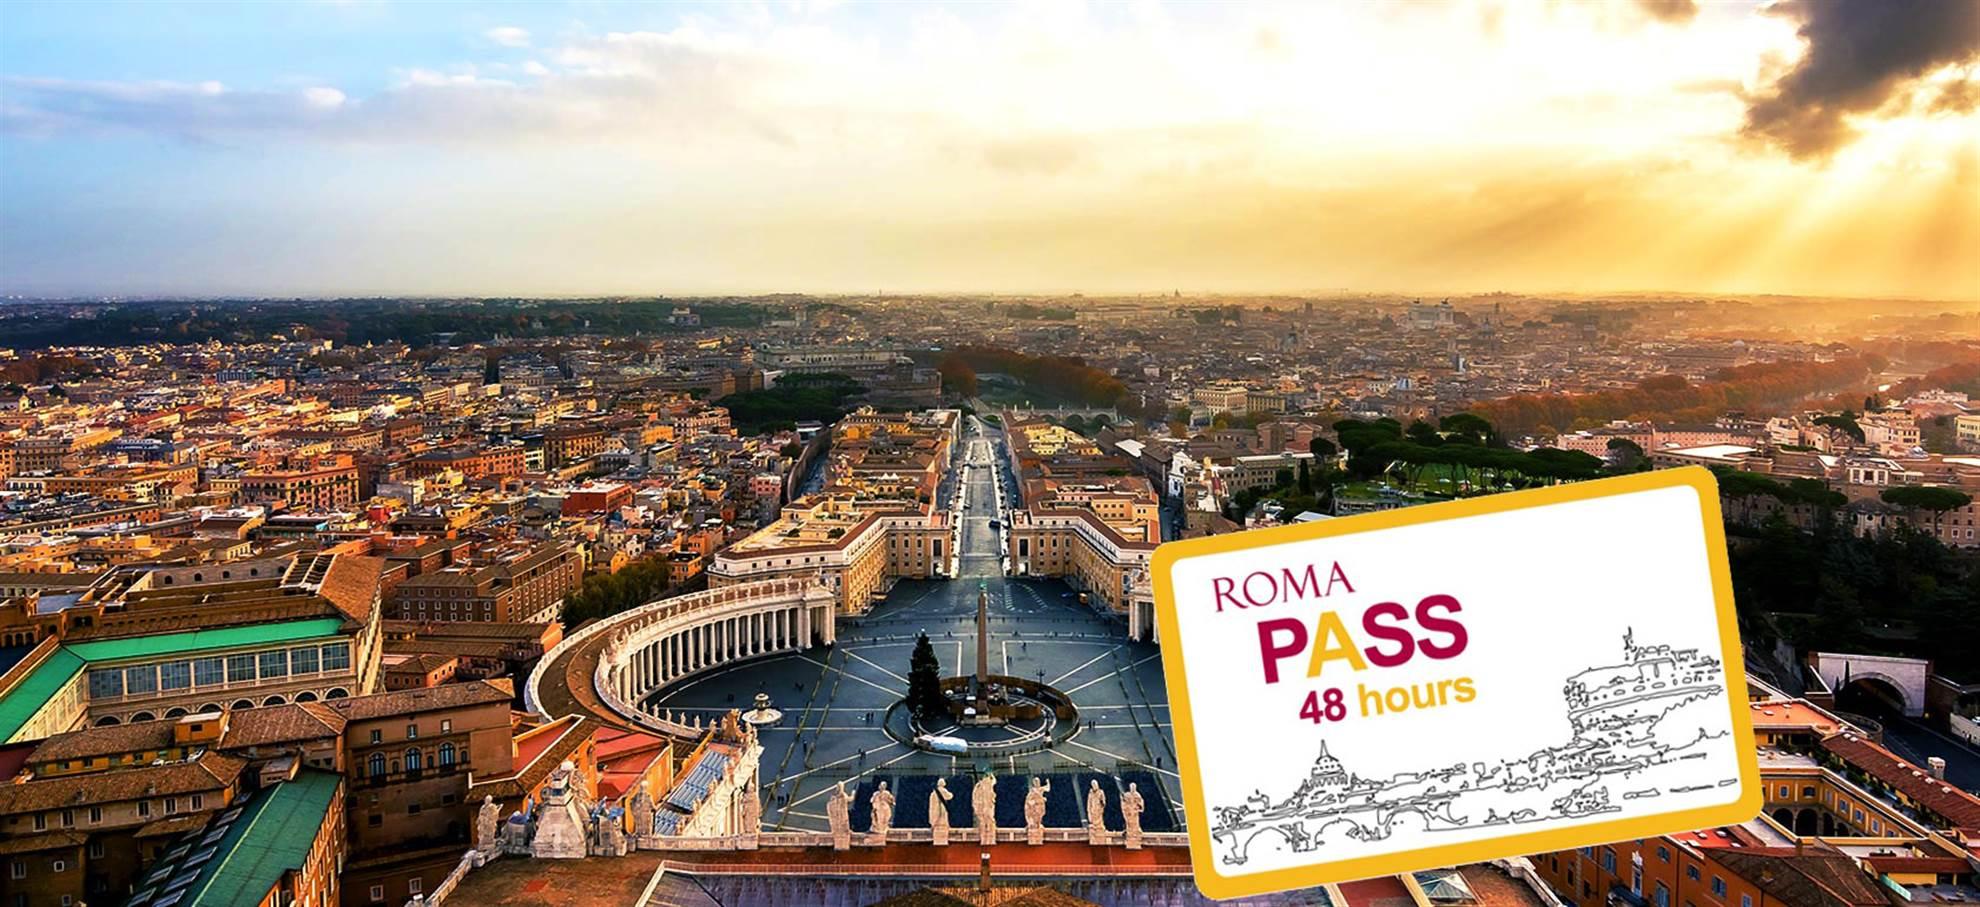 Roma Pass 48Horas (Opcional: Entradas sin colas para visitar la Basilica San Pedro)